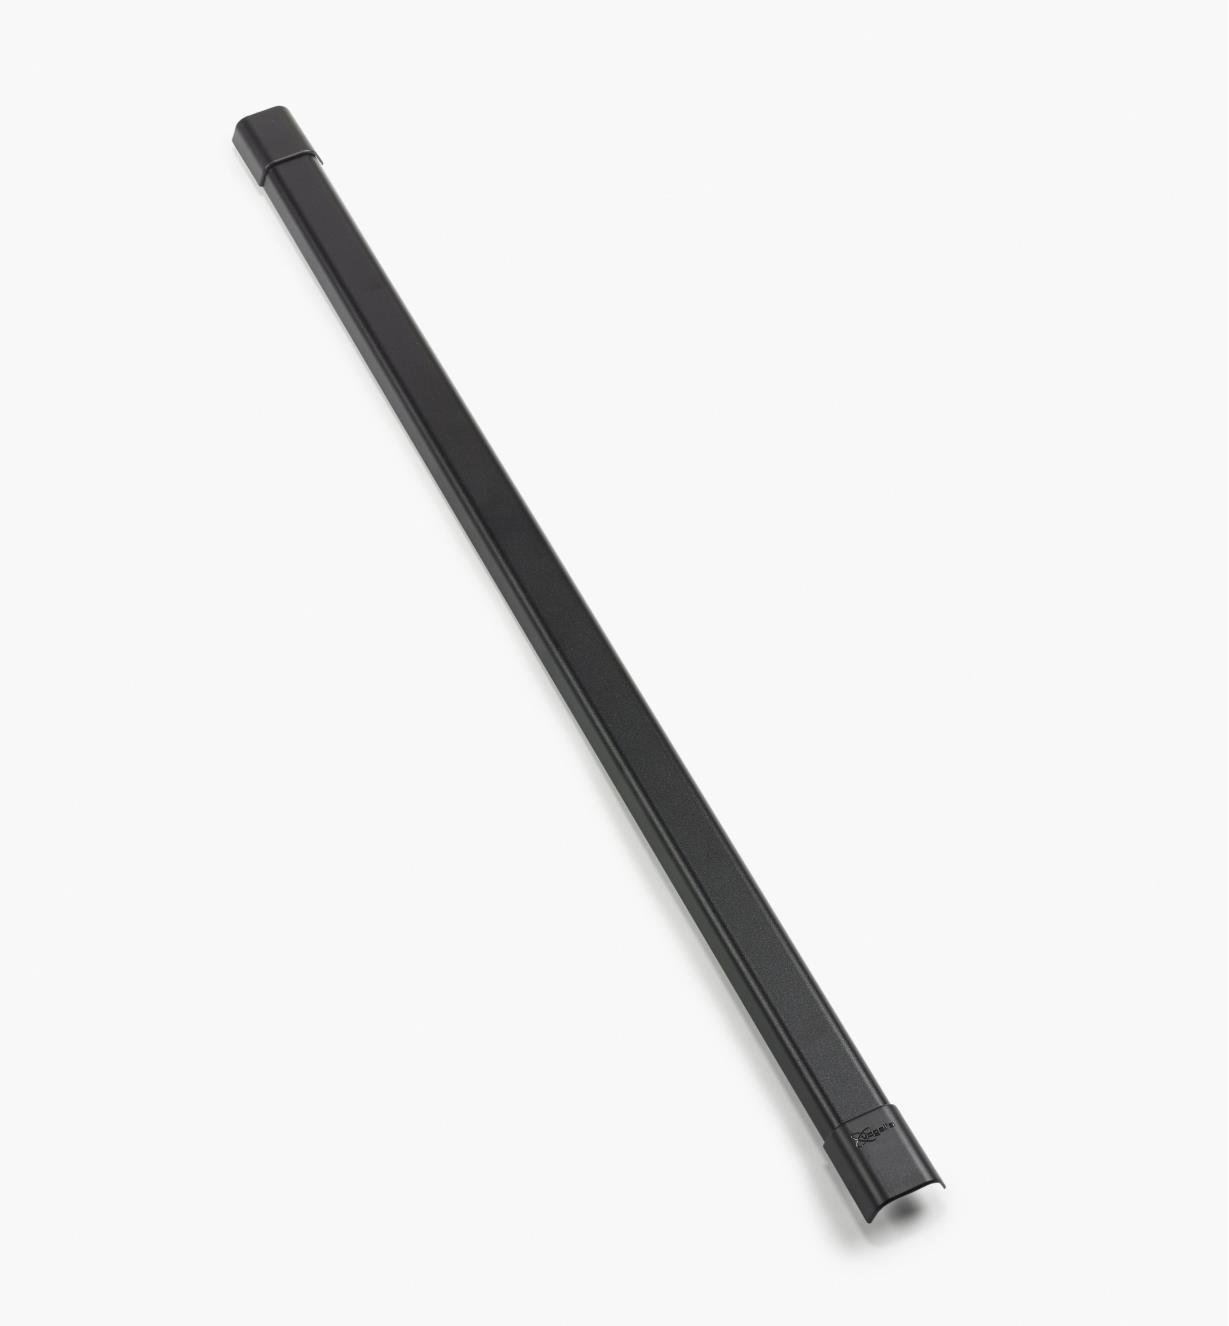 "00K6781 - 1 3/4"" x 35"" Aluminum Cable Cover, Black"